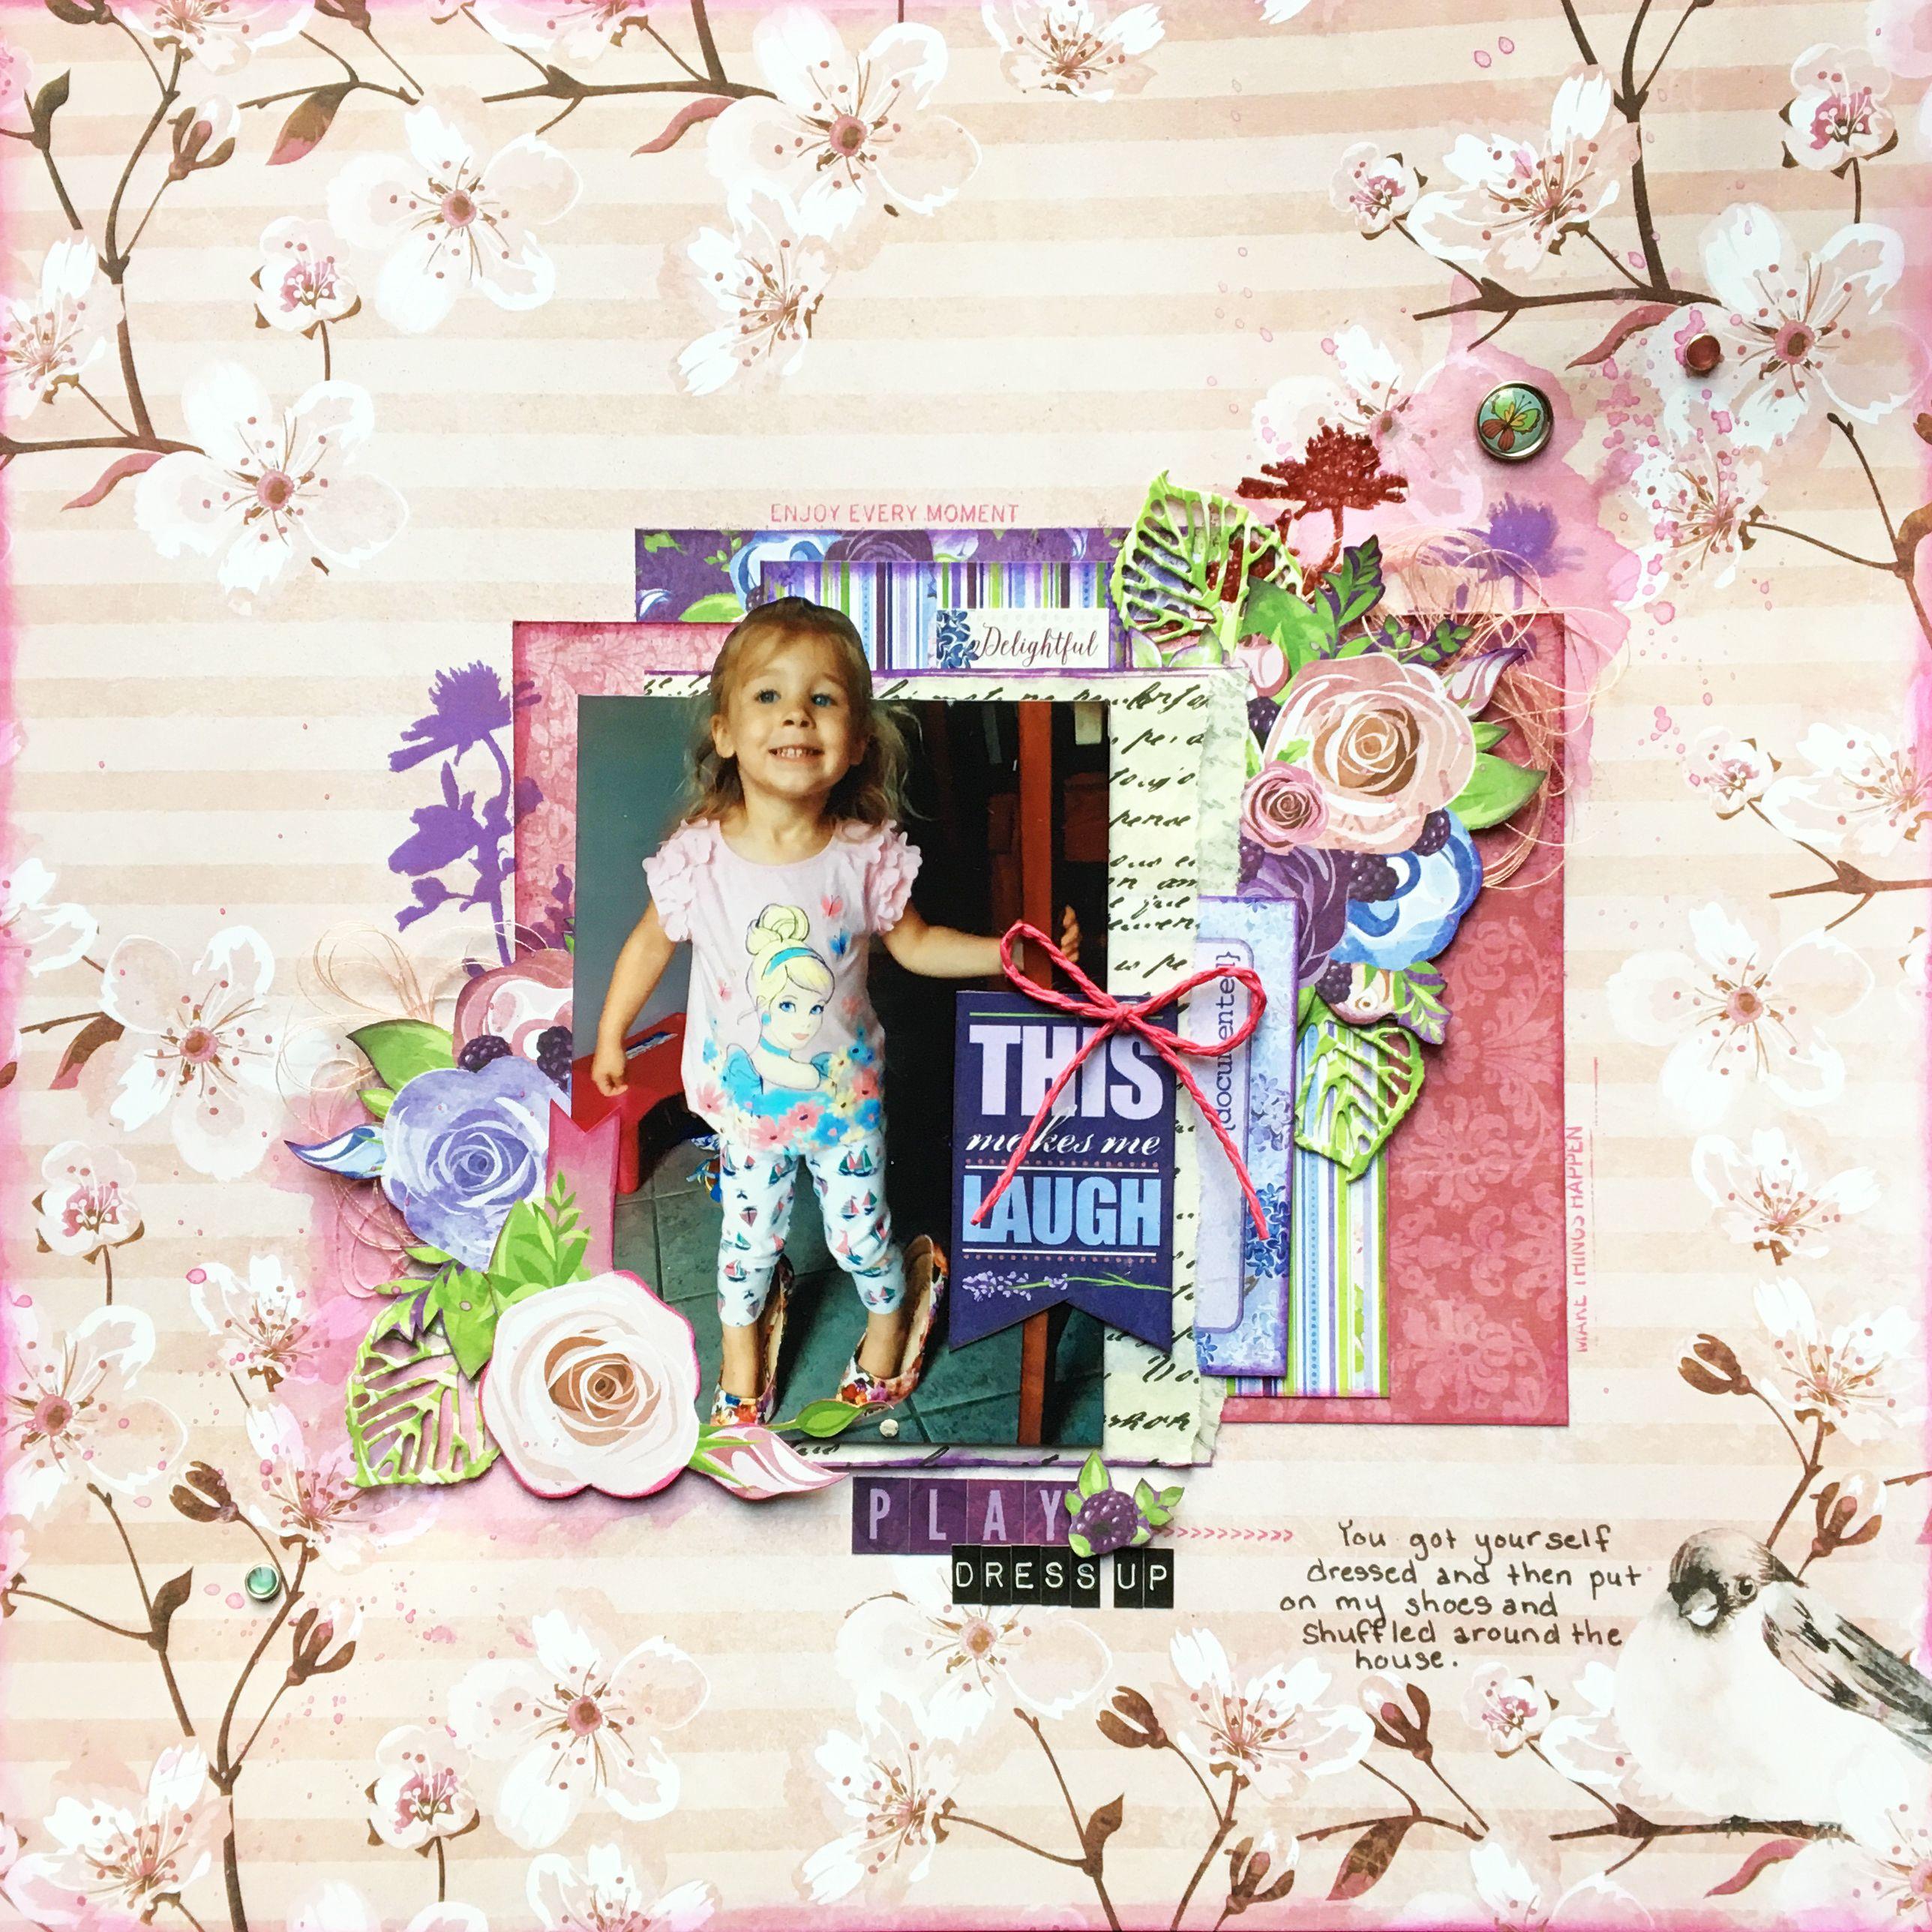 Play+Dress+Up - BoBunny - Secret Garden Collection | Bo Bunny Secret ...